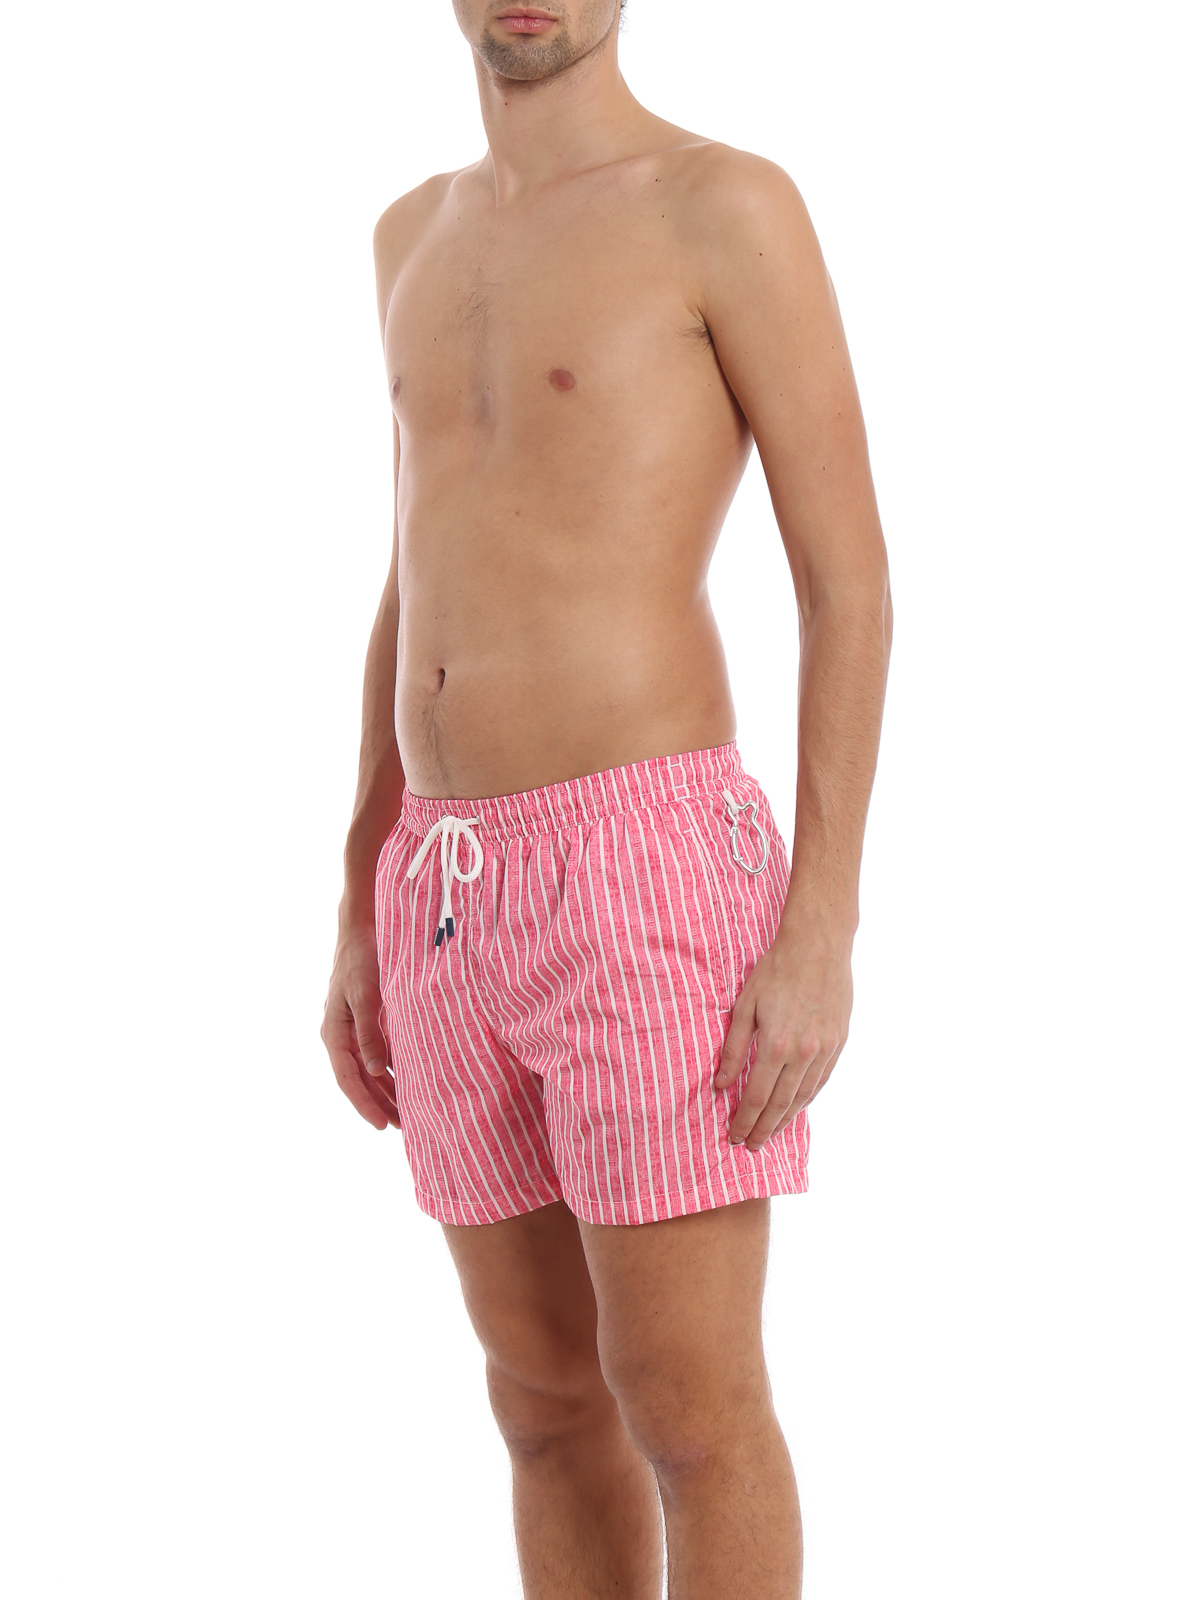 a5157c699e FEDELI: Swim shorts & swimming trunks online - Red and white striped swim  shorts